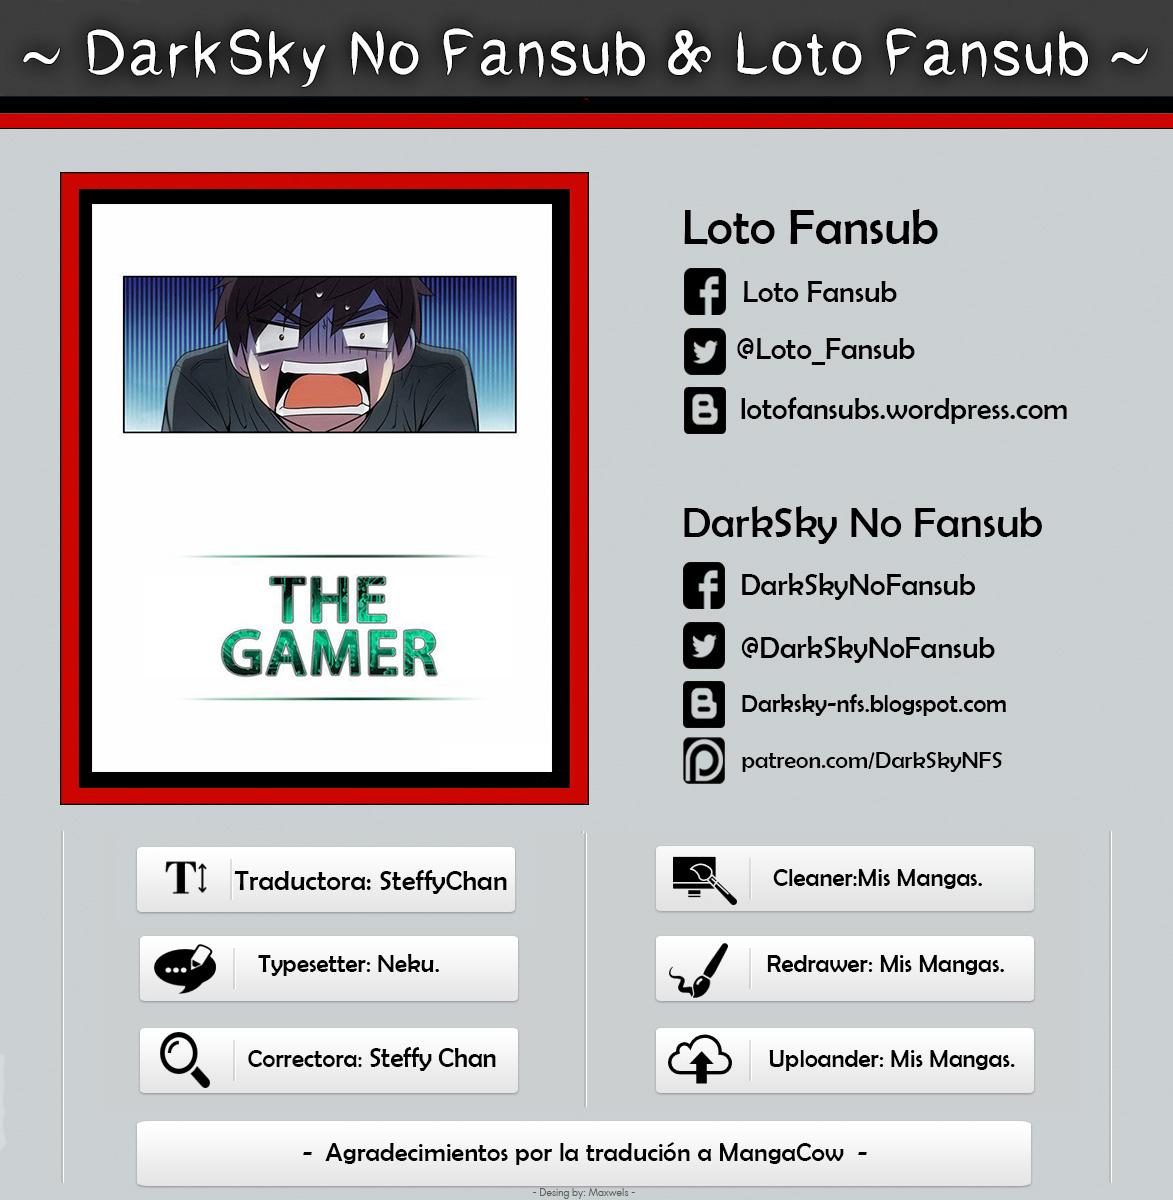 http://c5.ninemanga.com/es_manga/61/1725/420034/7b22e82dc419d460a9f3deddc33b54d8.jpg Page 1